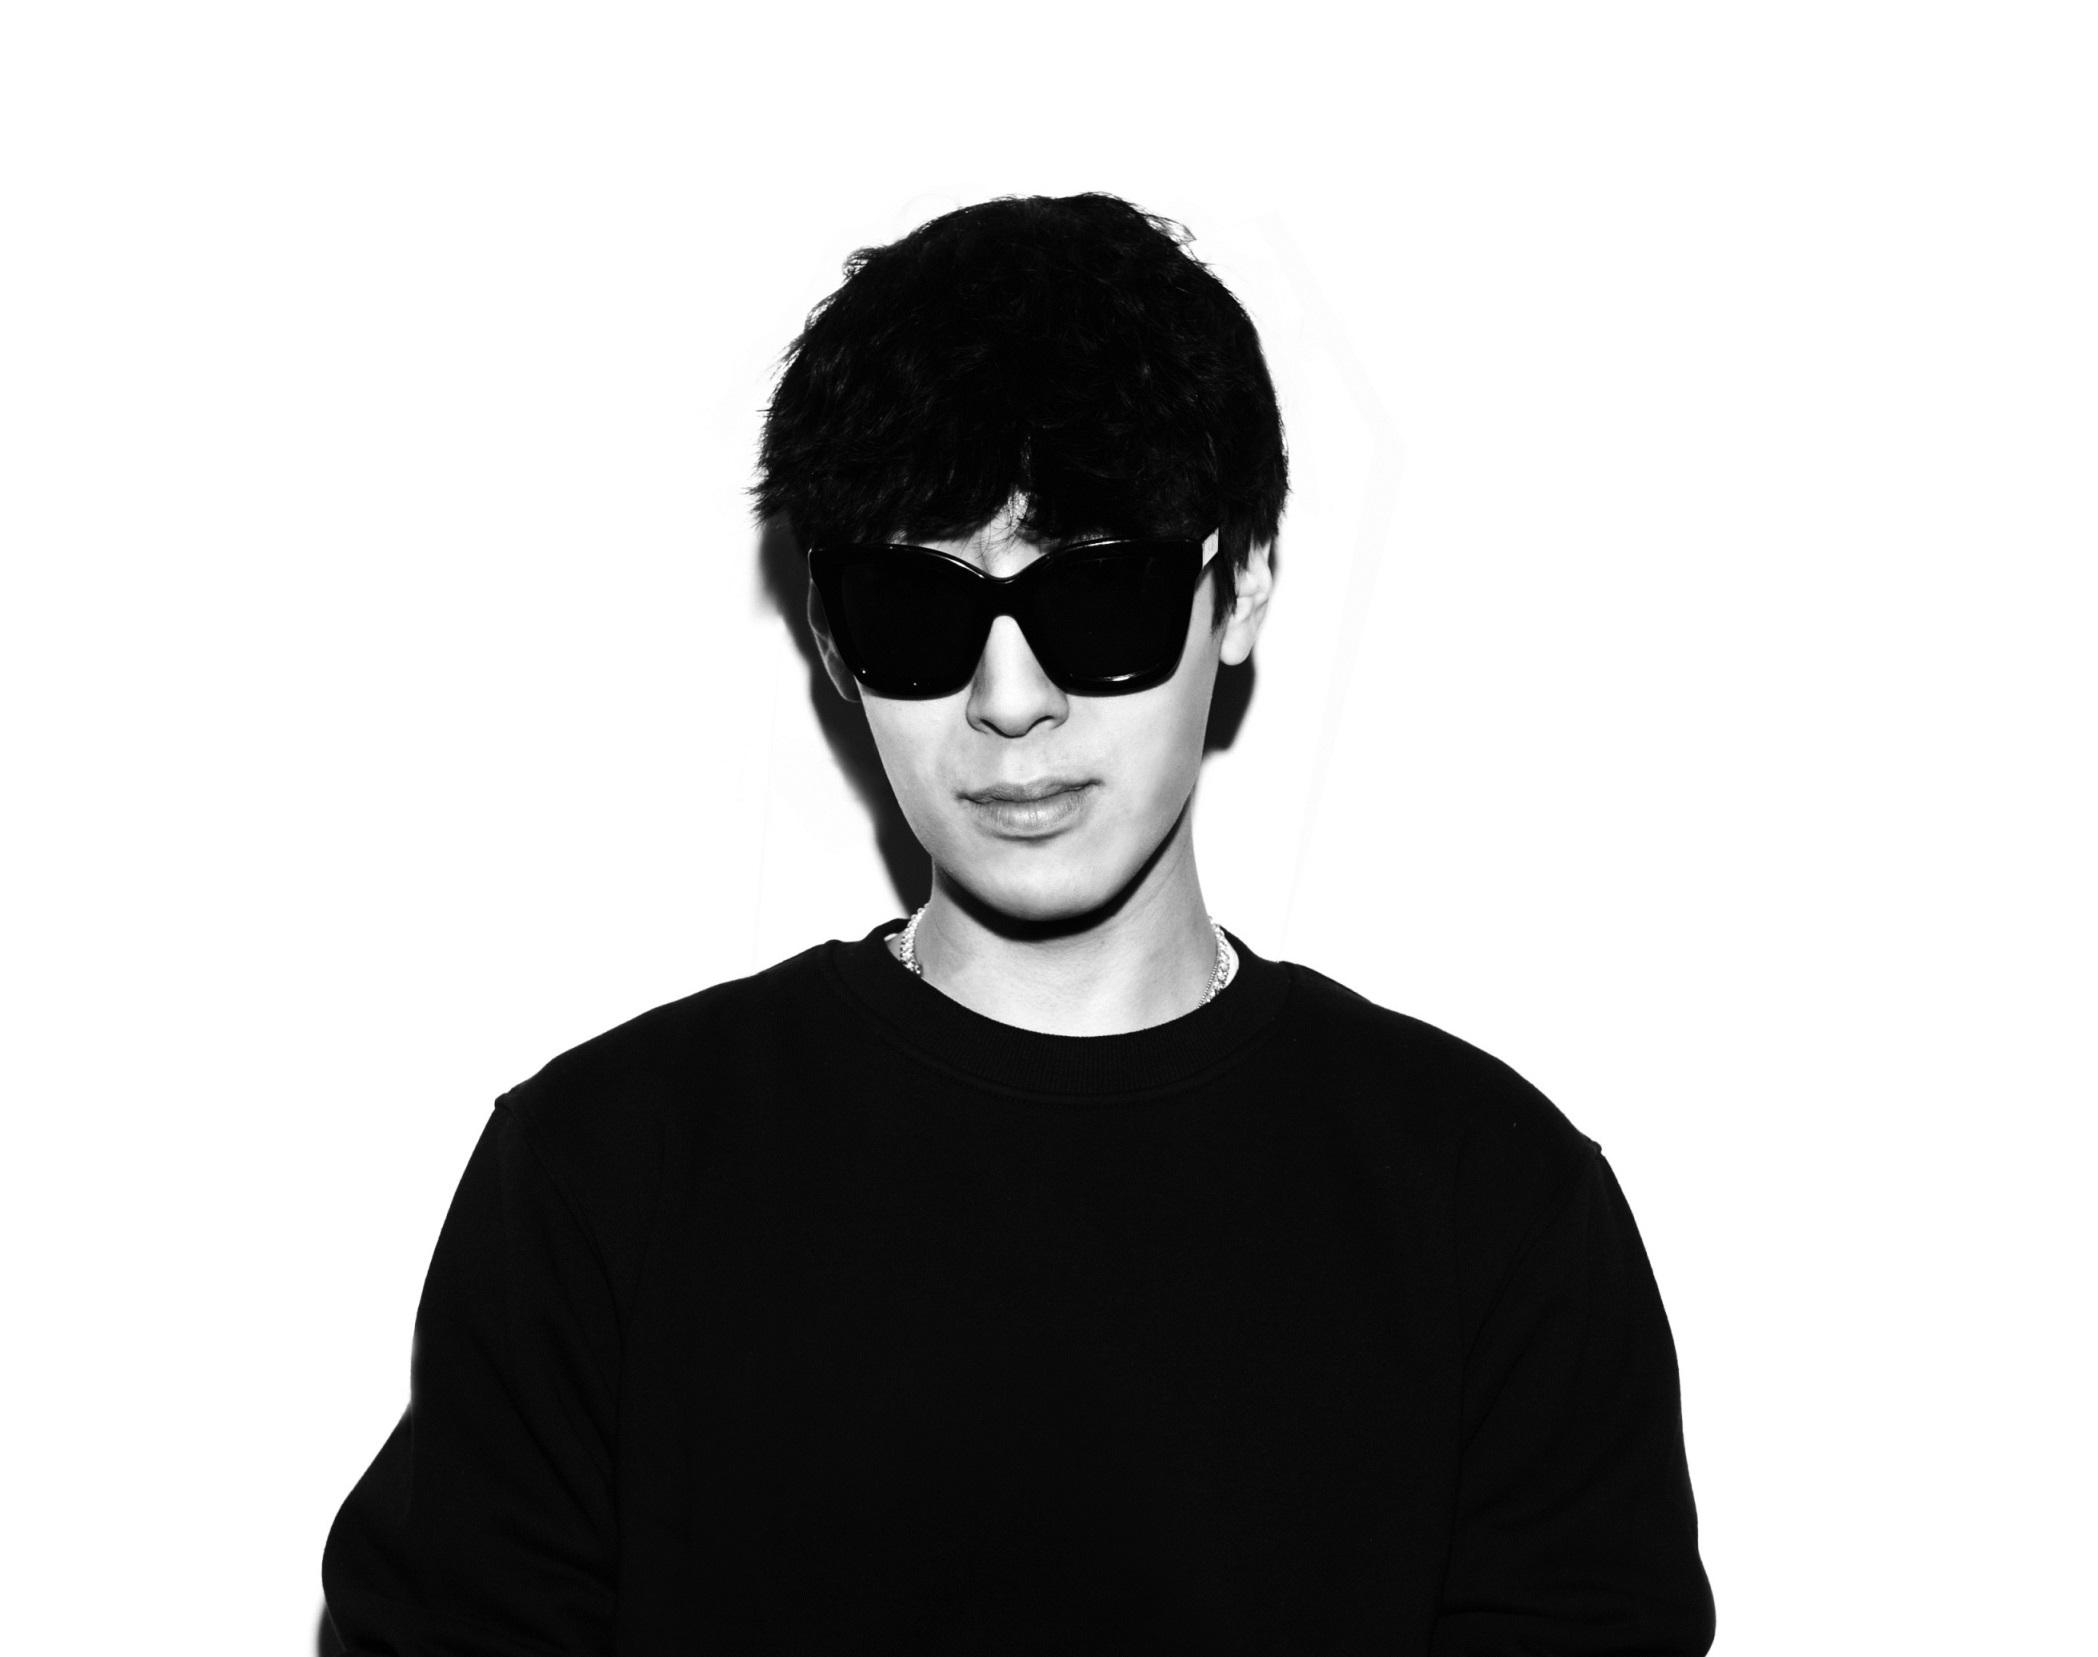 Ko Taeyong